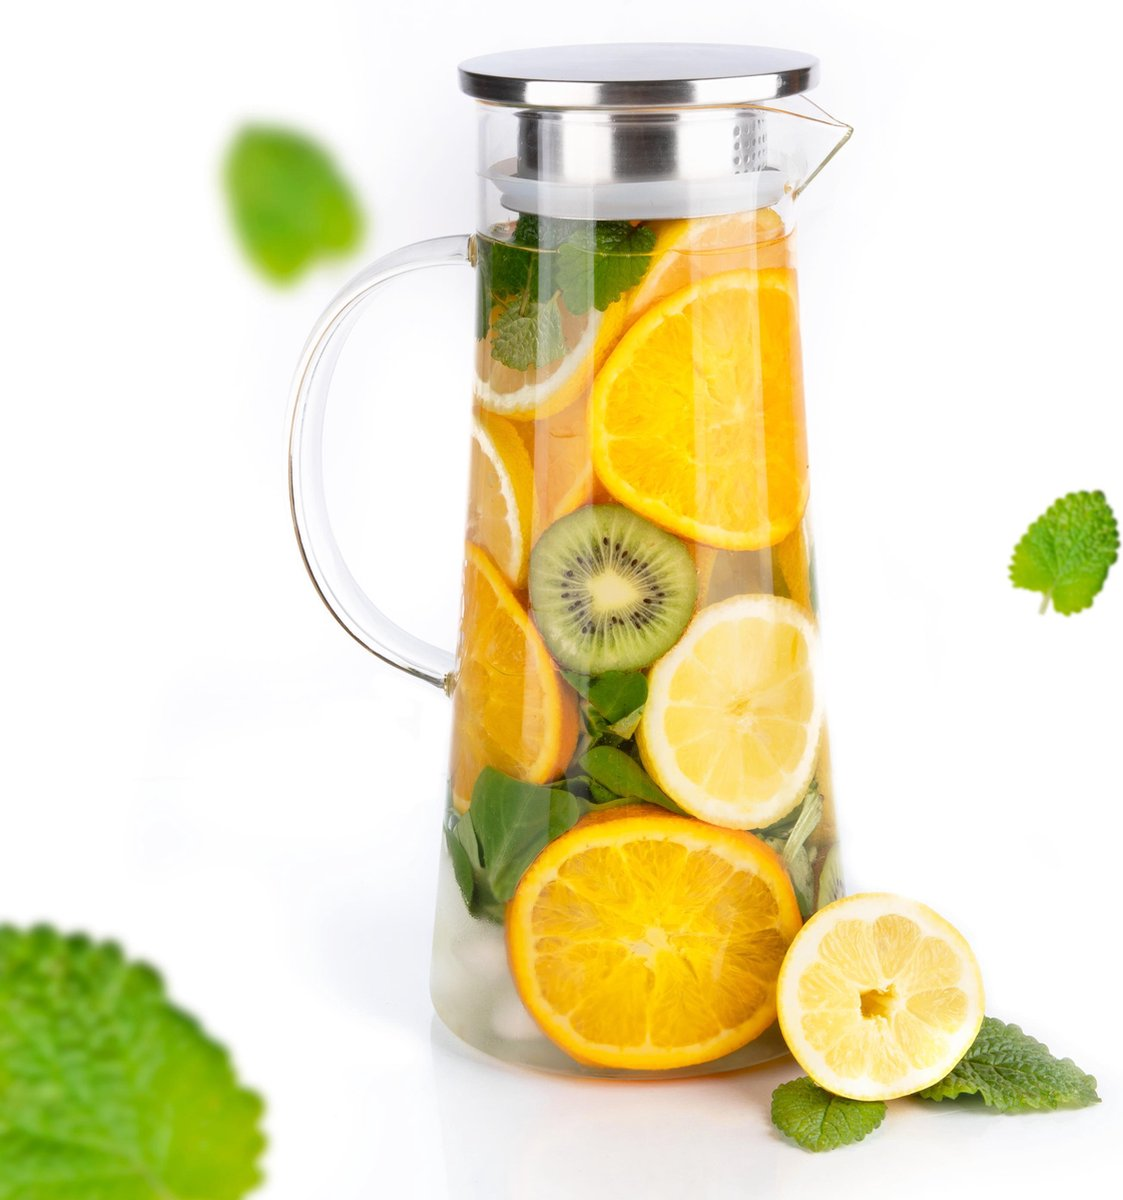 MÊZON® Glazen Waterkan - Waterkaraf voor Fruitwater - Multifunctionele Decanteer Karaf - Kan met Deksel - 1.5L Capaciteit